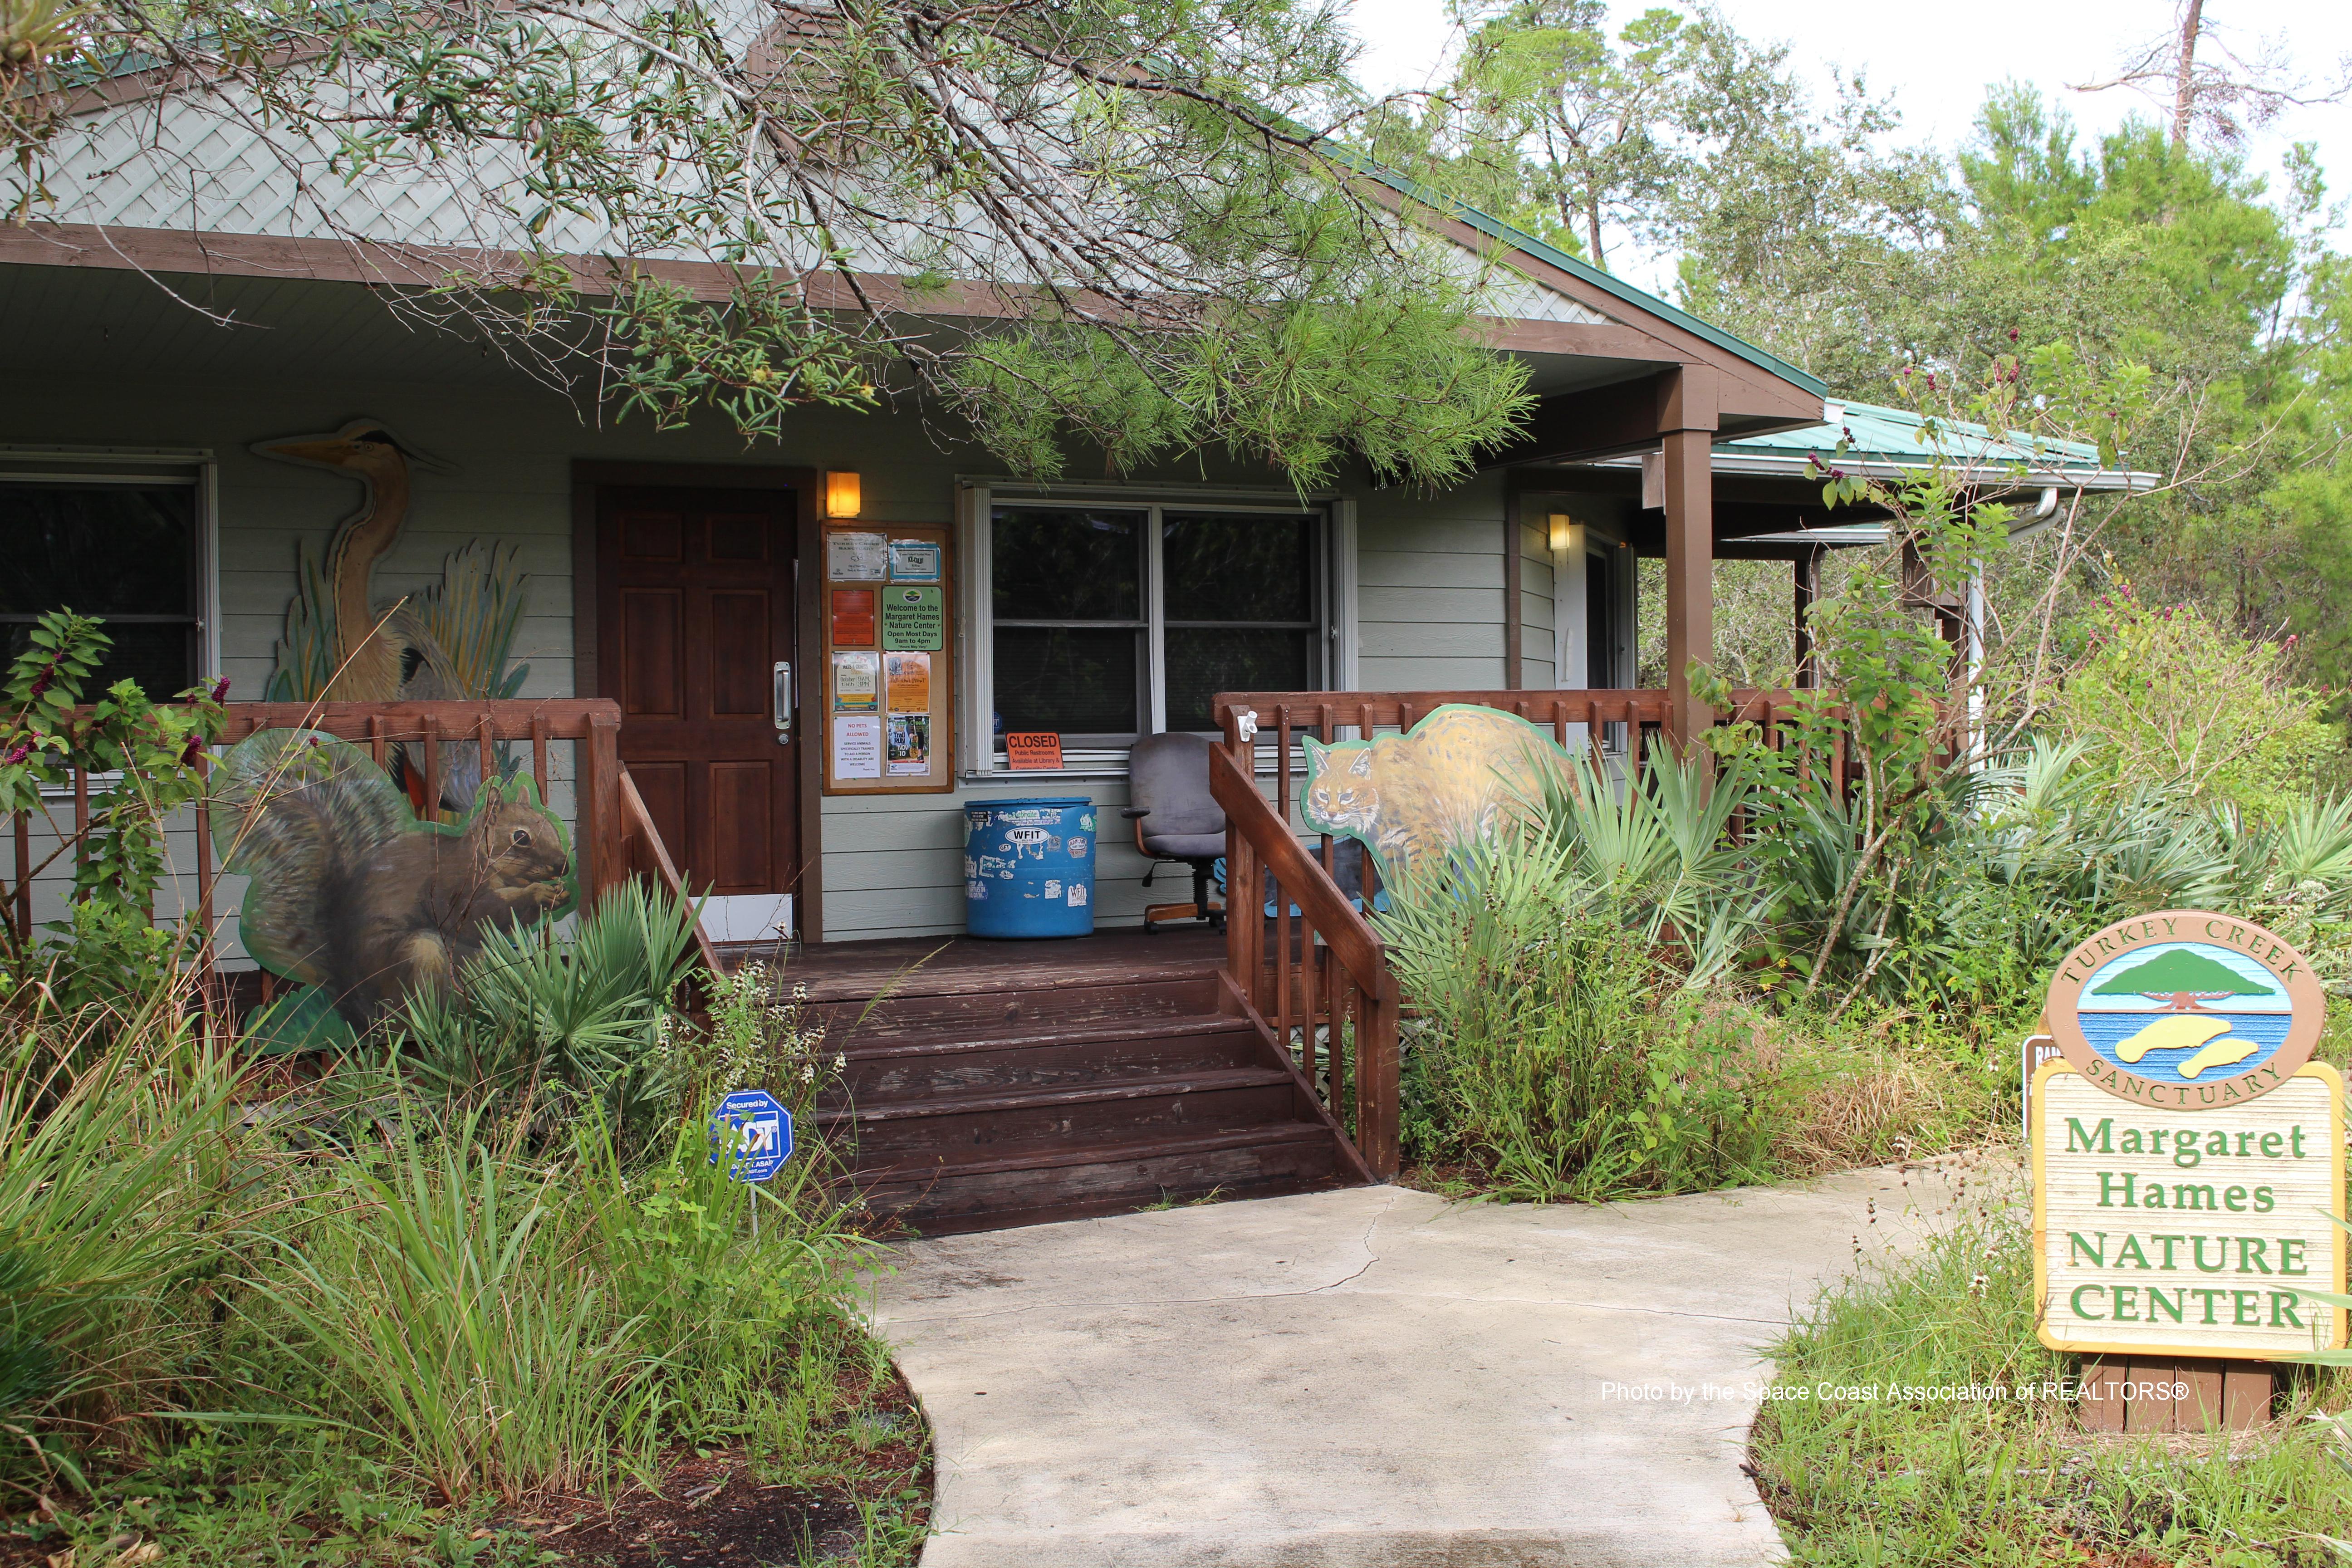 Turkey Creek Sanctuary, Margaret Hames Nature Center, Palm Bay, Florida